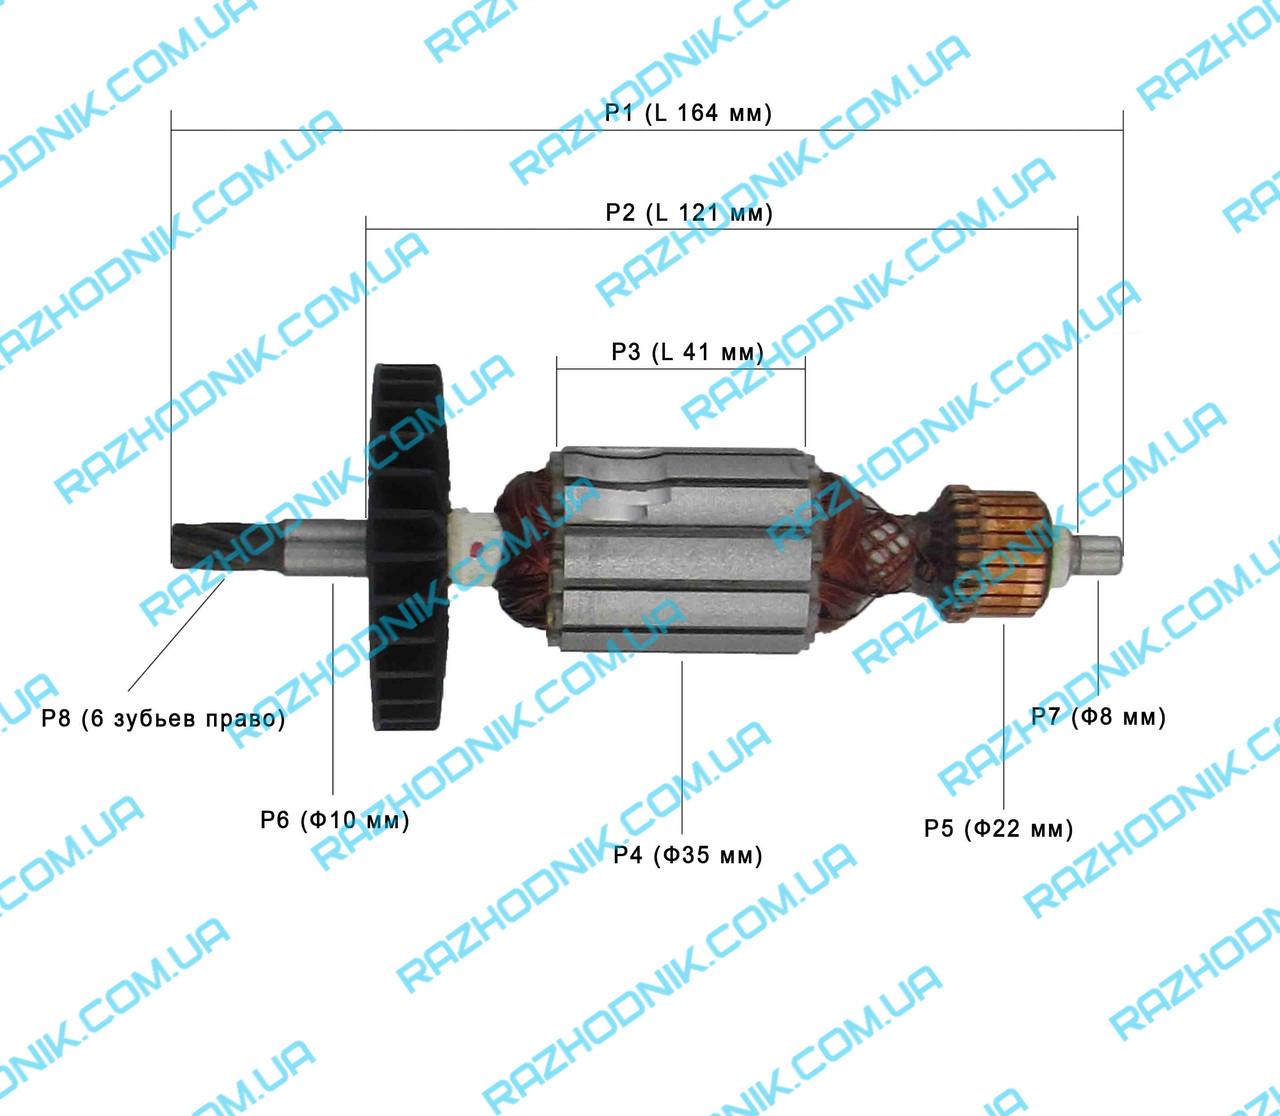 Якорь на перфоратор Forte PLRH 24-8R,Eltos ПЭ-1200